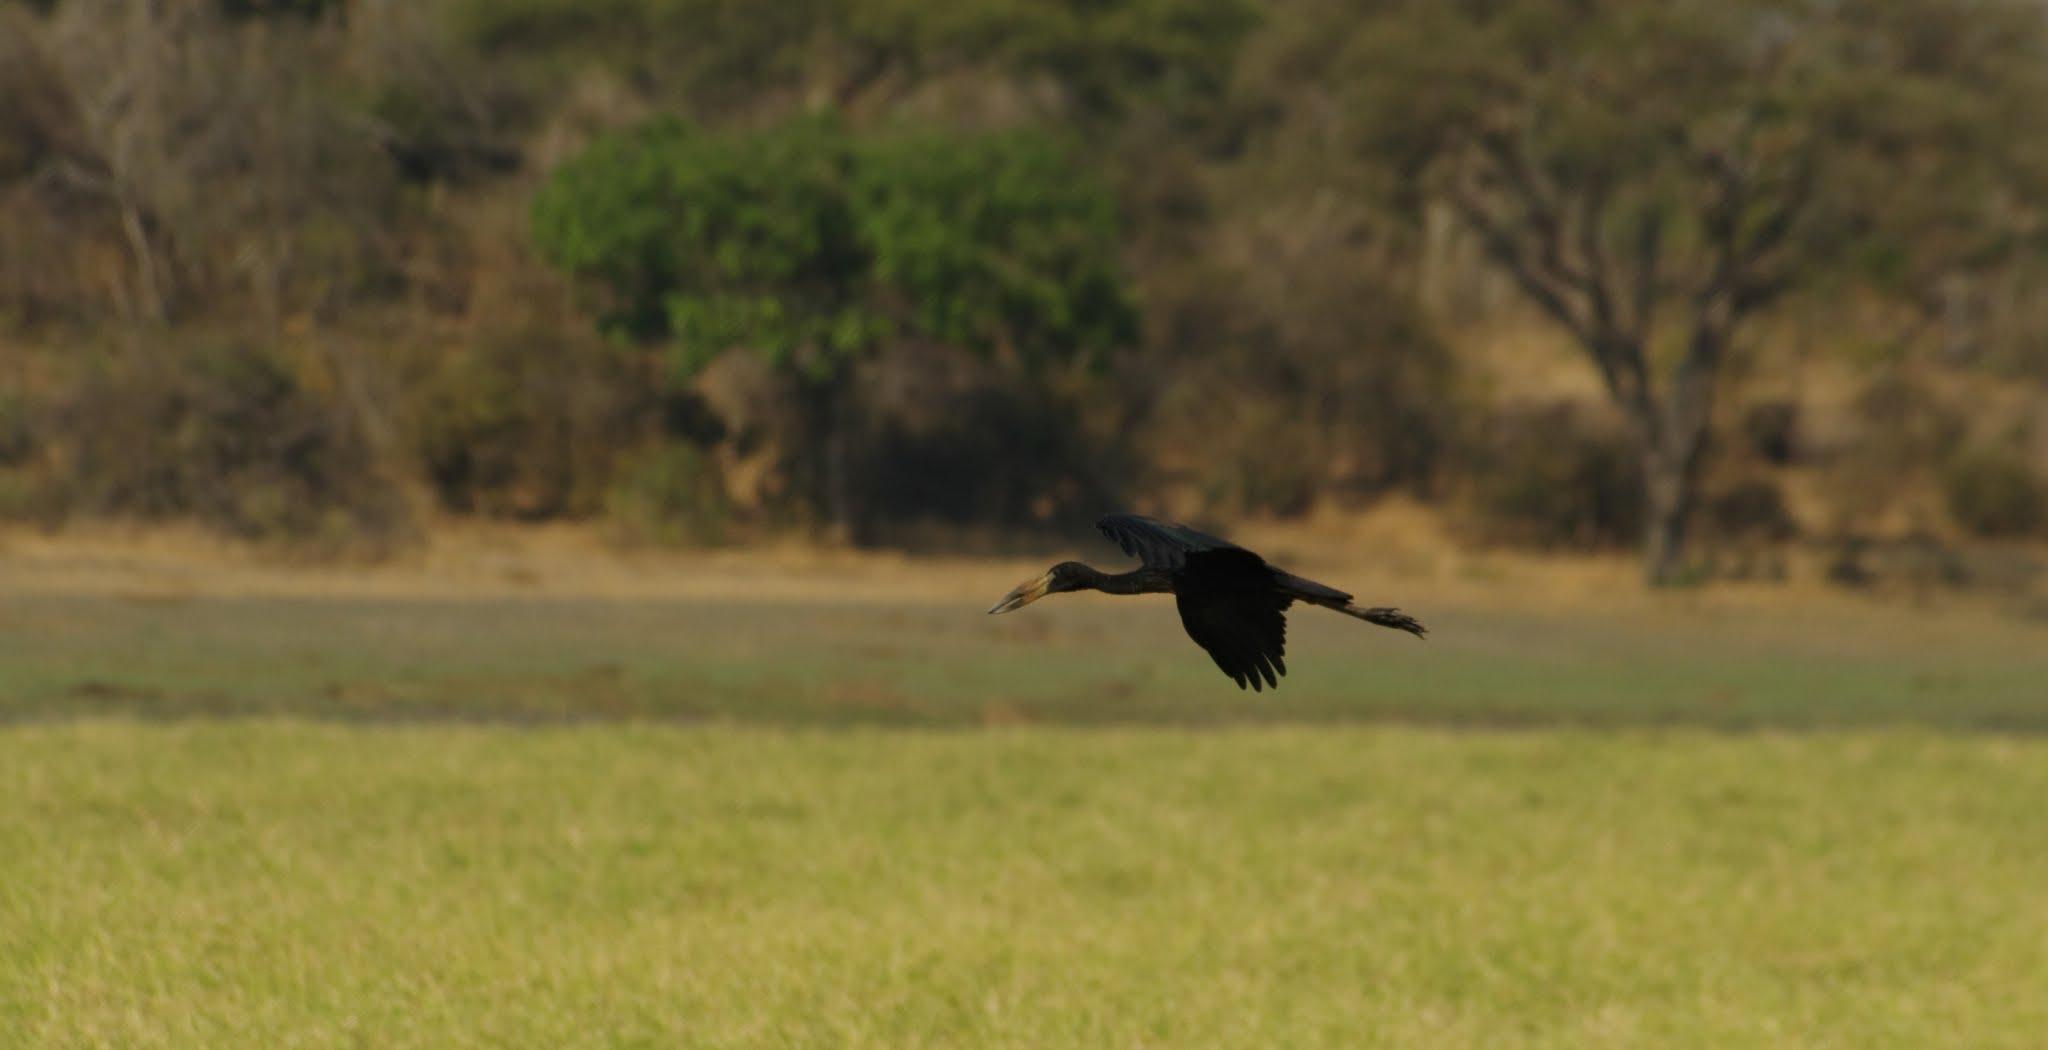 bec-ouvert-africain-katavi-08-14